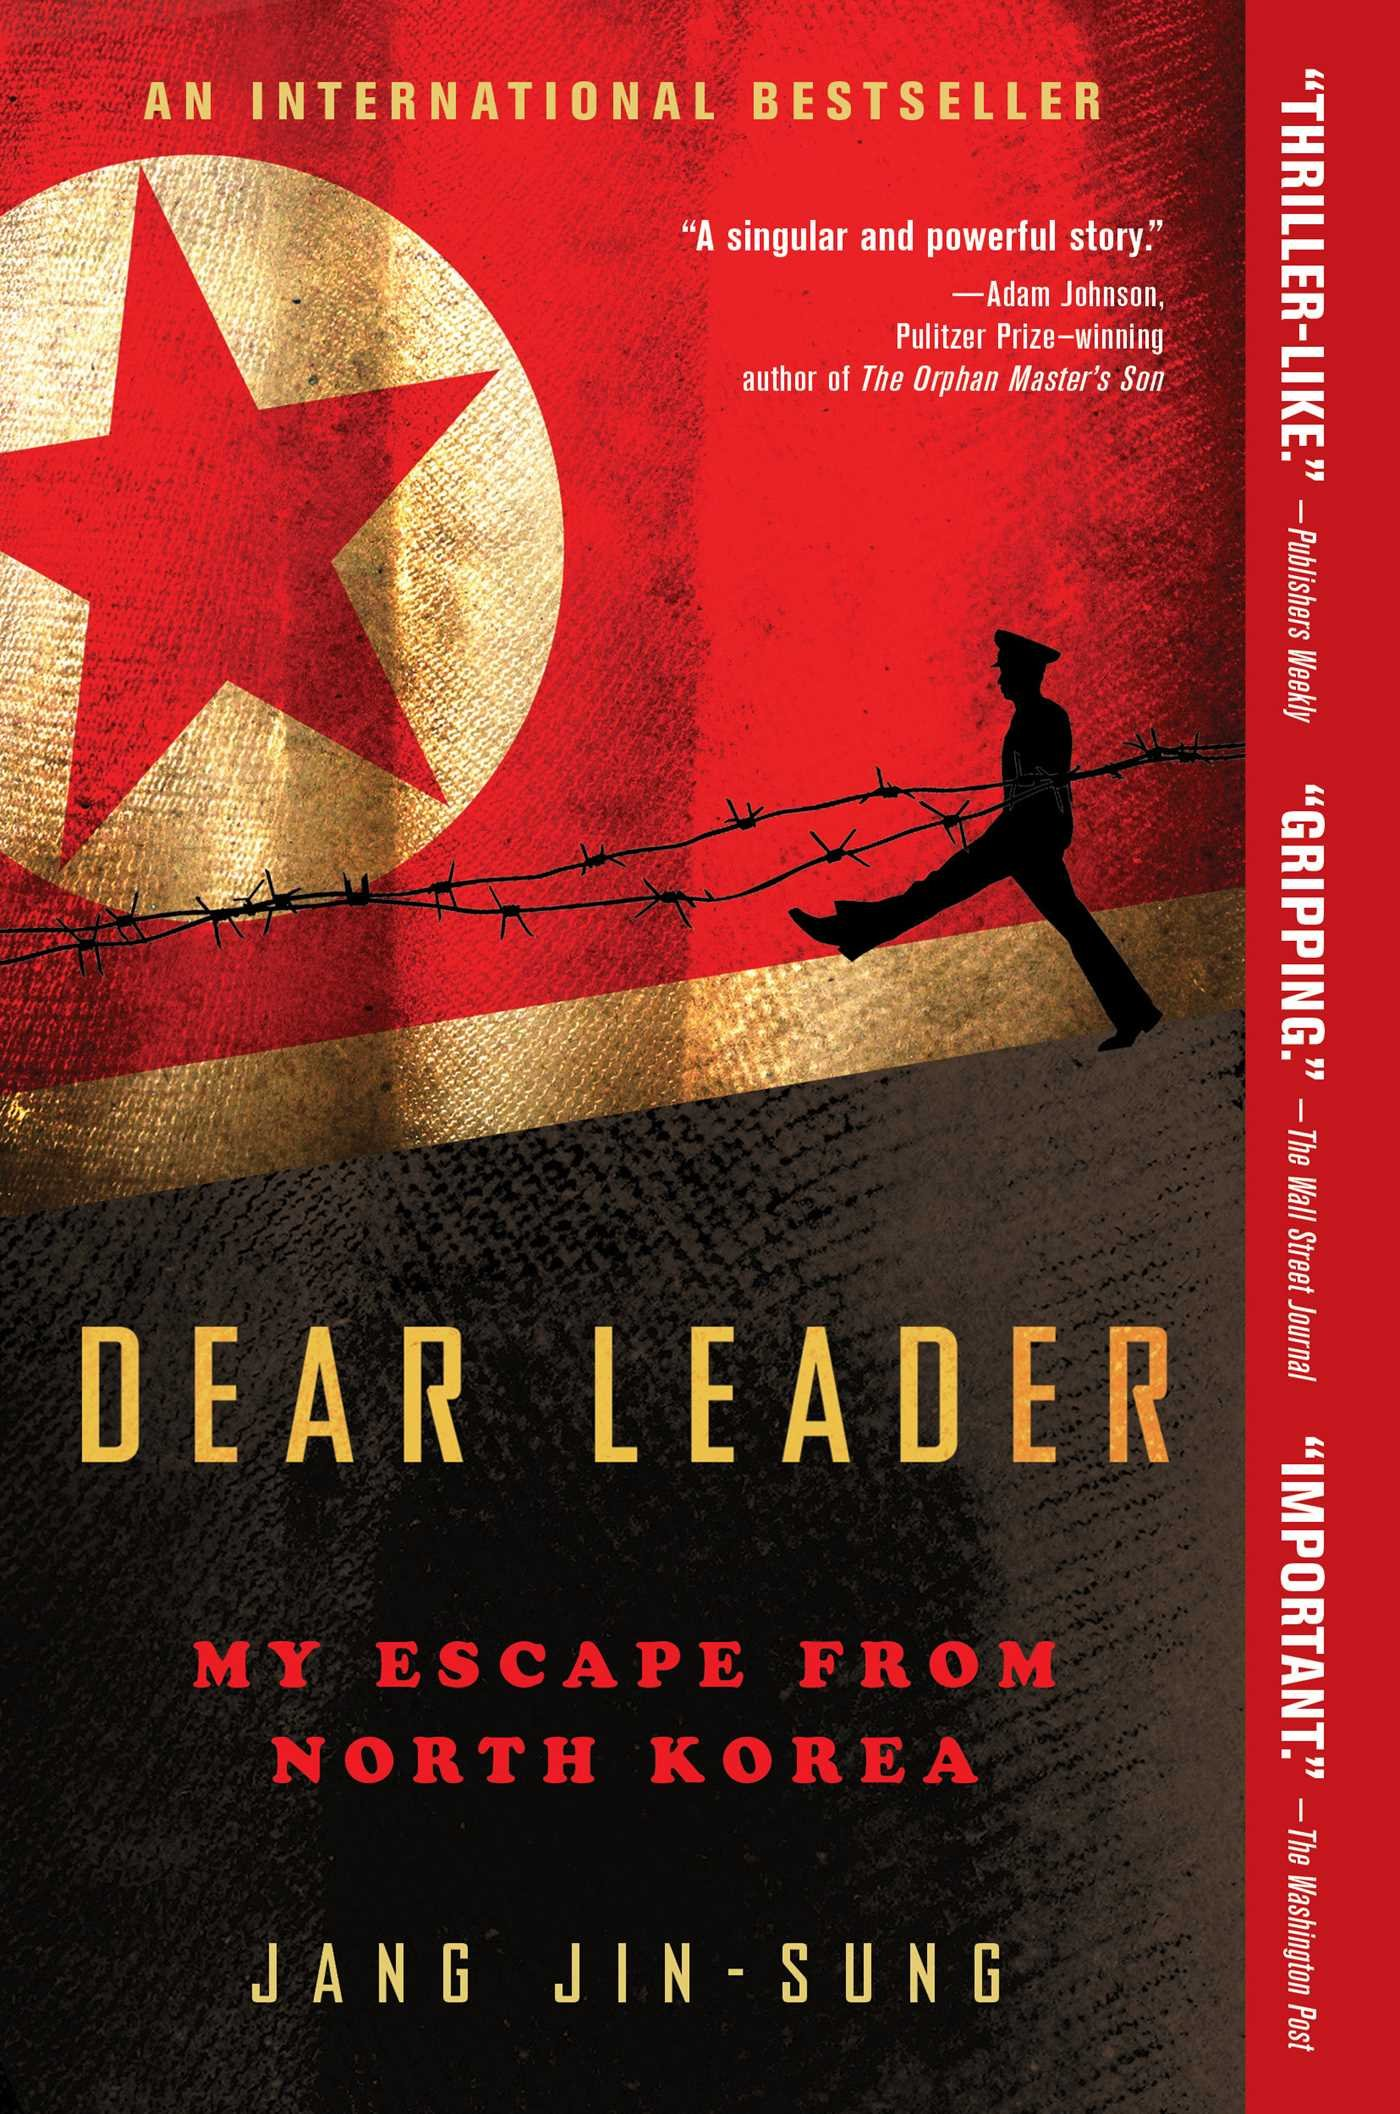 Dear leader book review